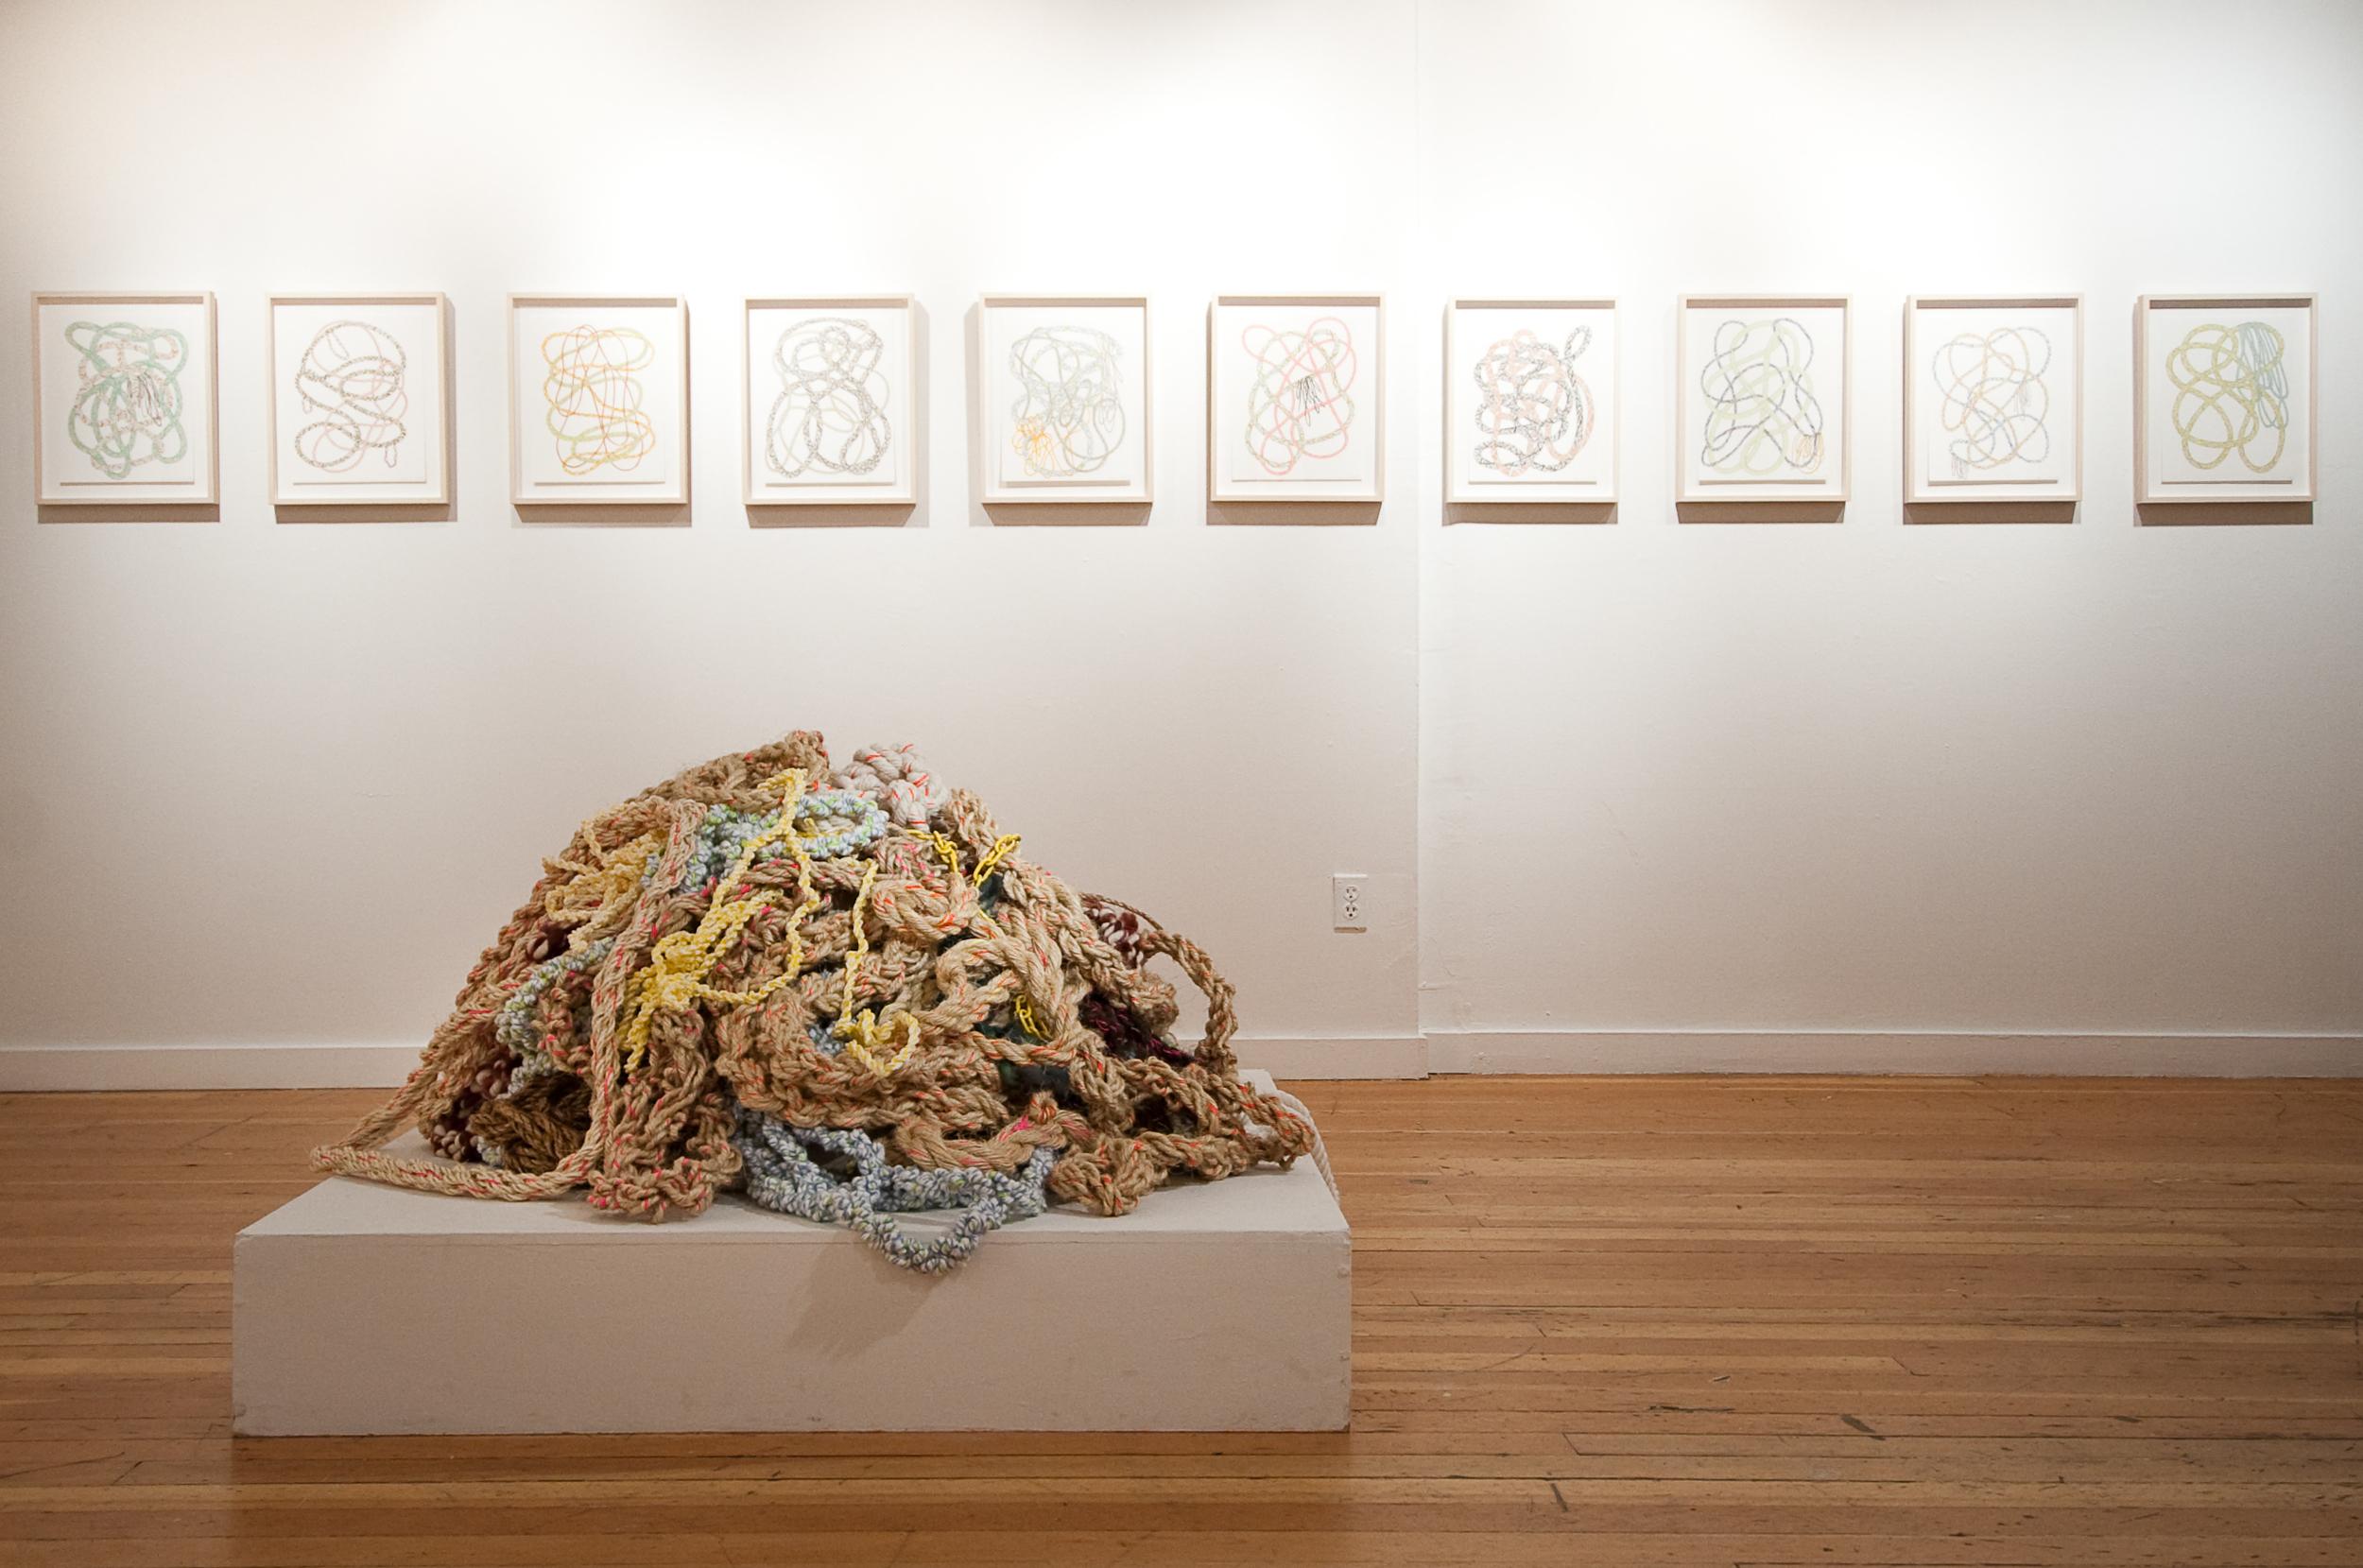 Pattie Lee Becker's Ropes exhibition at BMoCA 2010